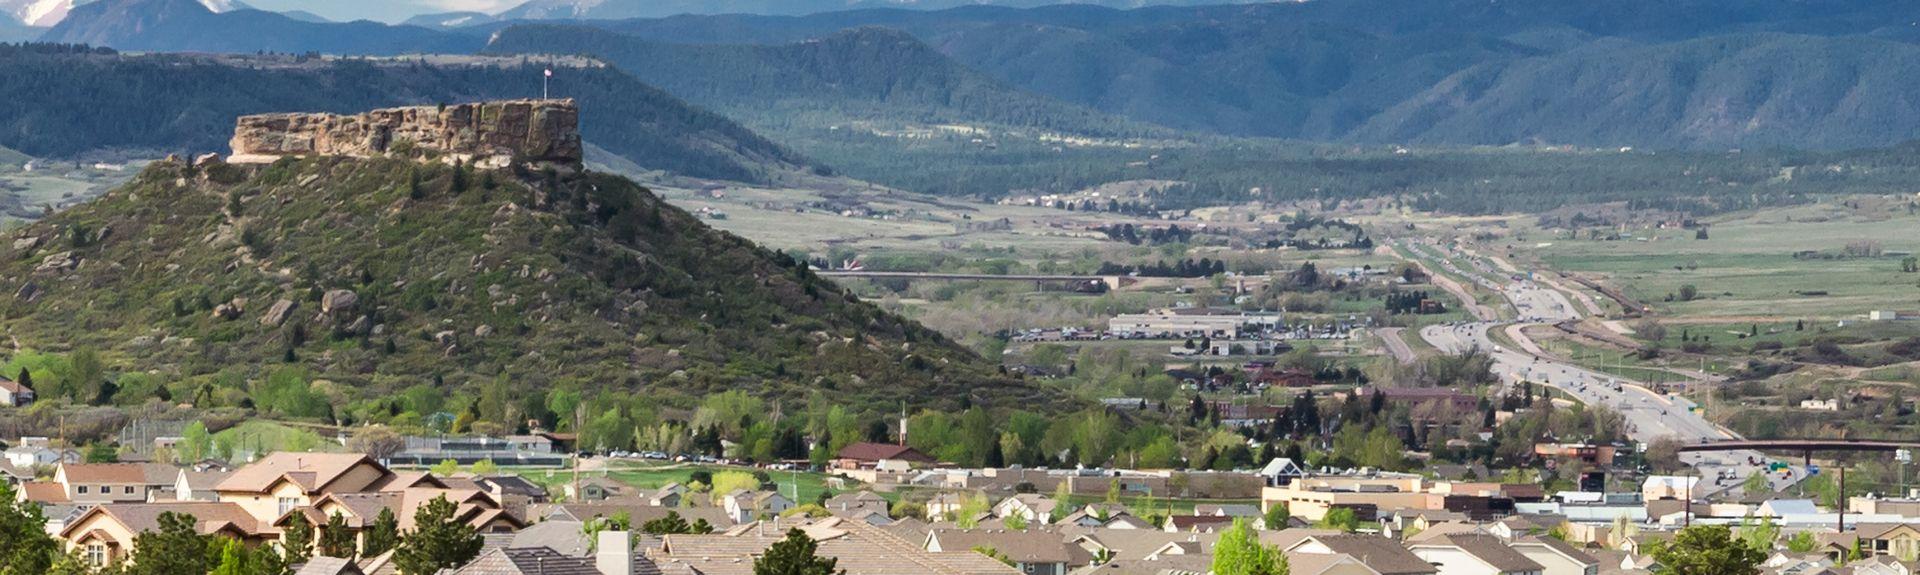 Castle Rock, Colorado, United States of America